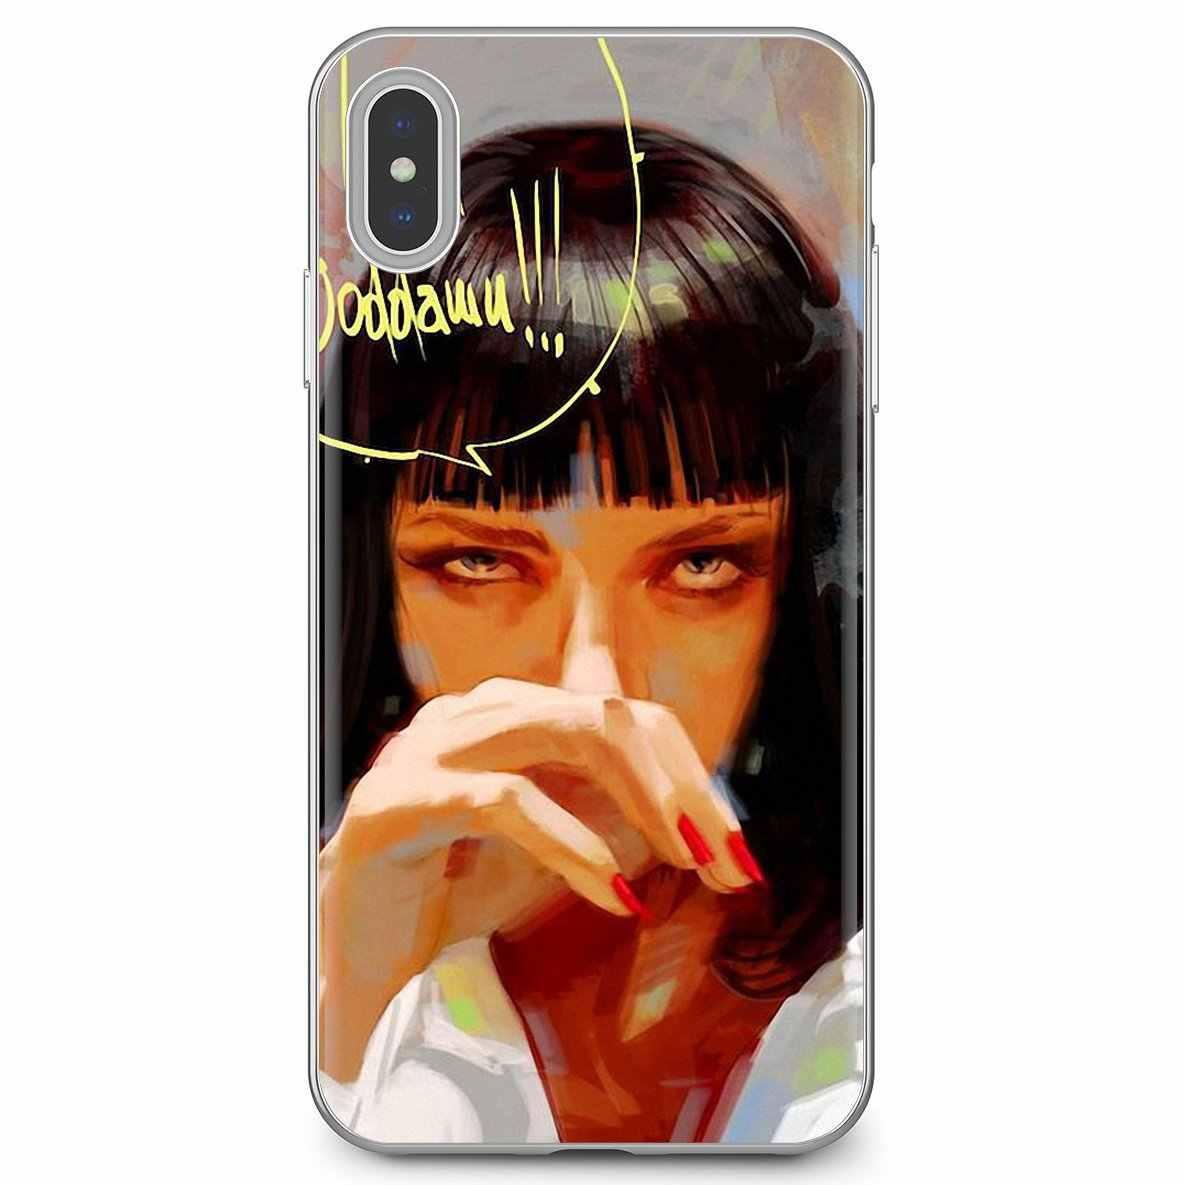 Mia wallace Pulp Fiction Für Huawei G7 G8 P7 P8 P9 P10 P20 P30 Lite Mini Pro P Smart 2017 2018 2019 Designer Silikon Telefon Fall